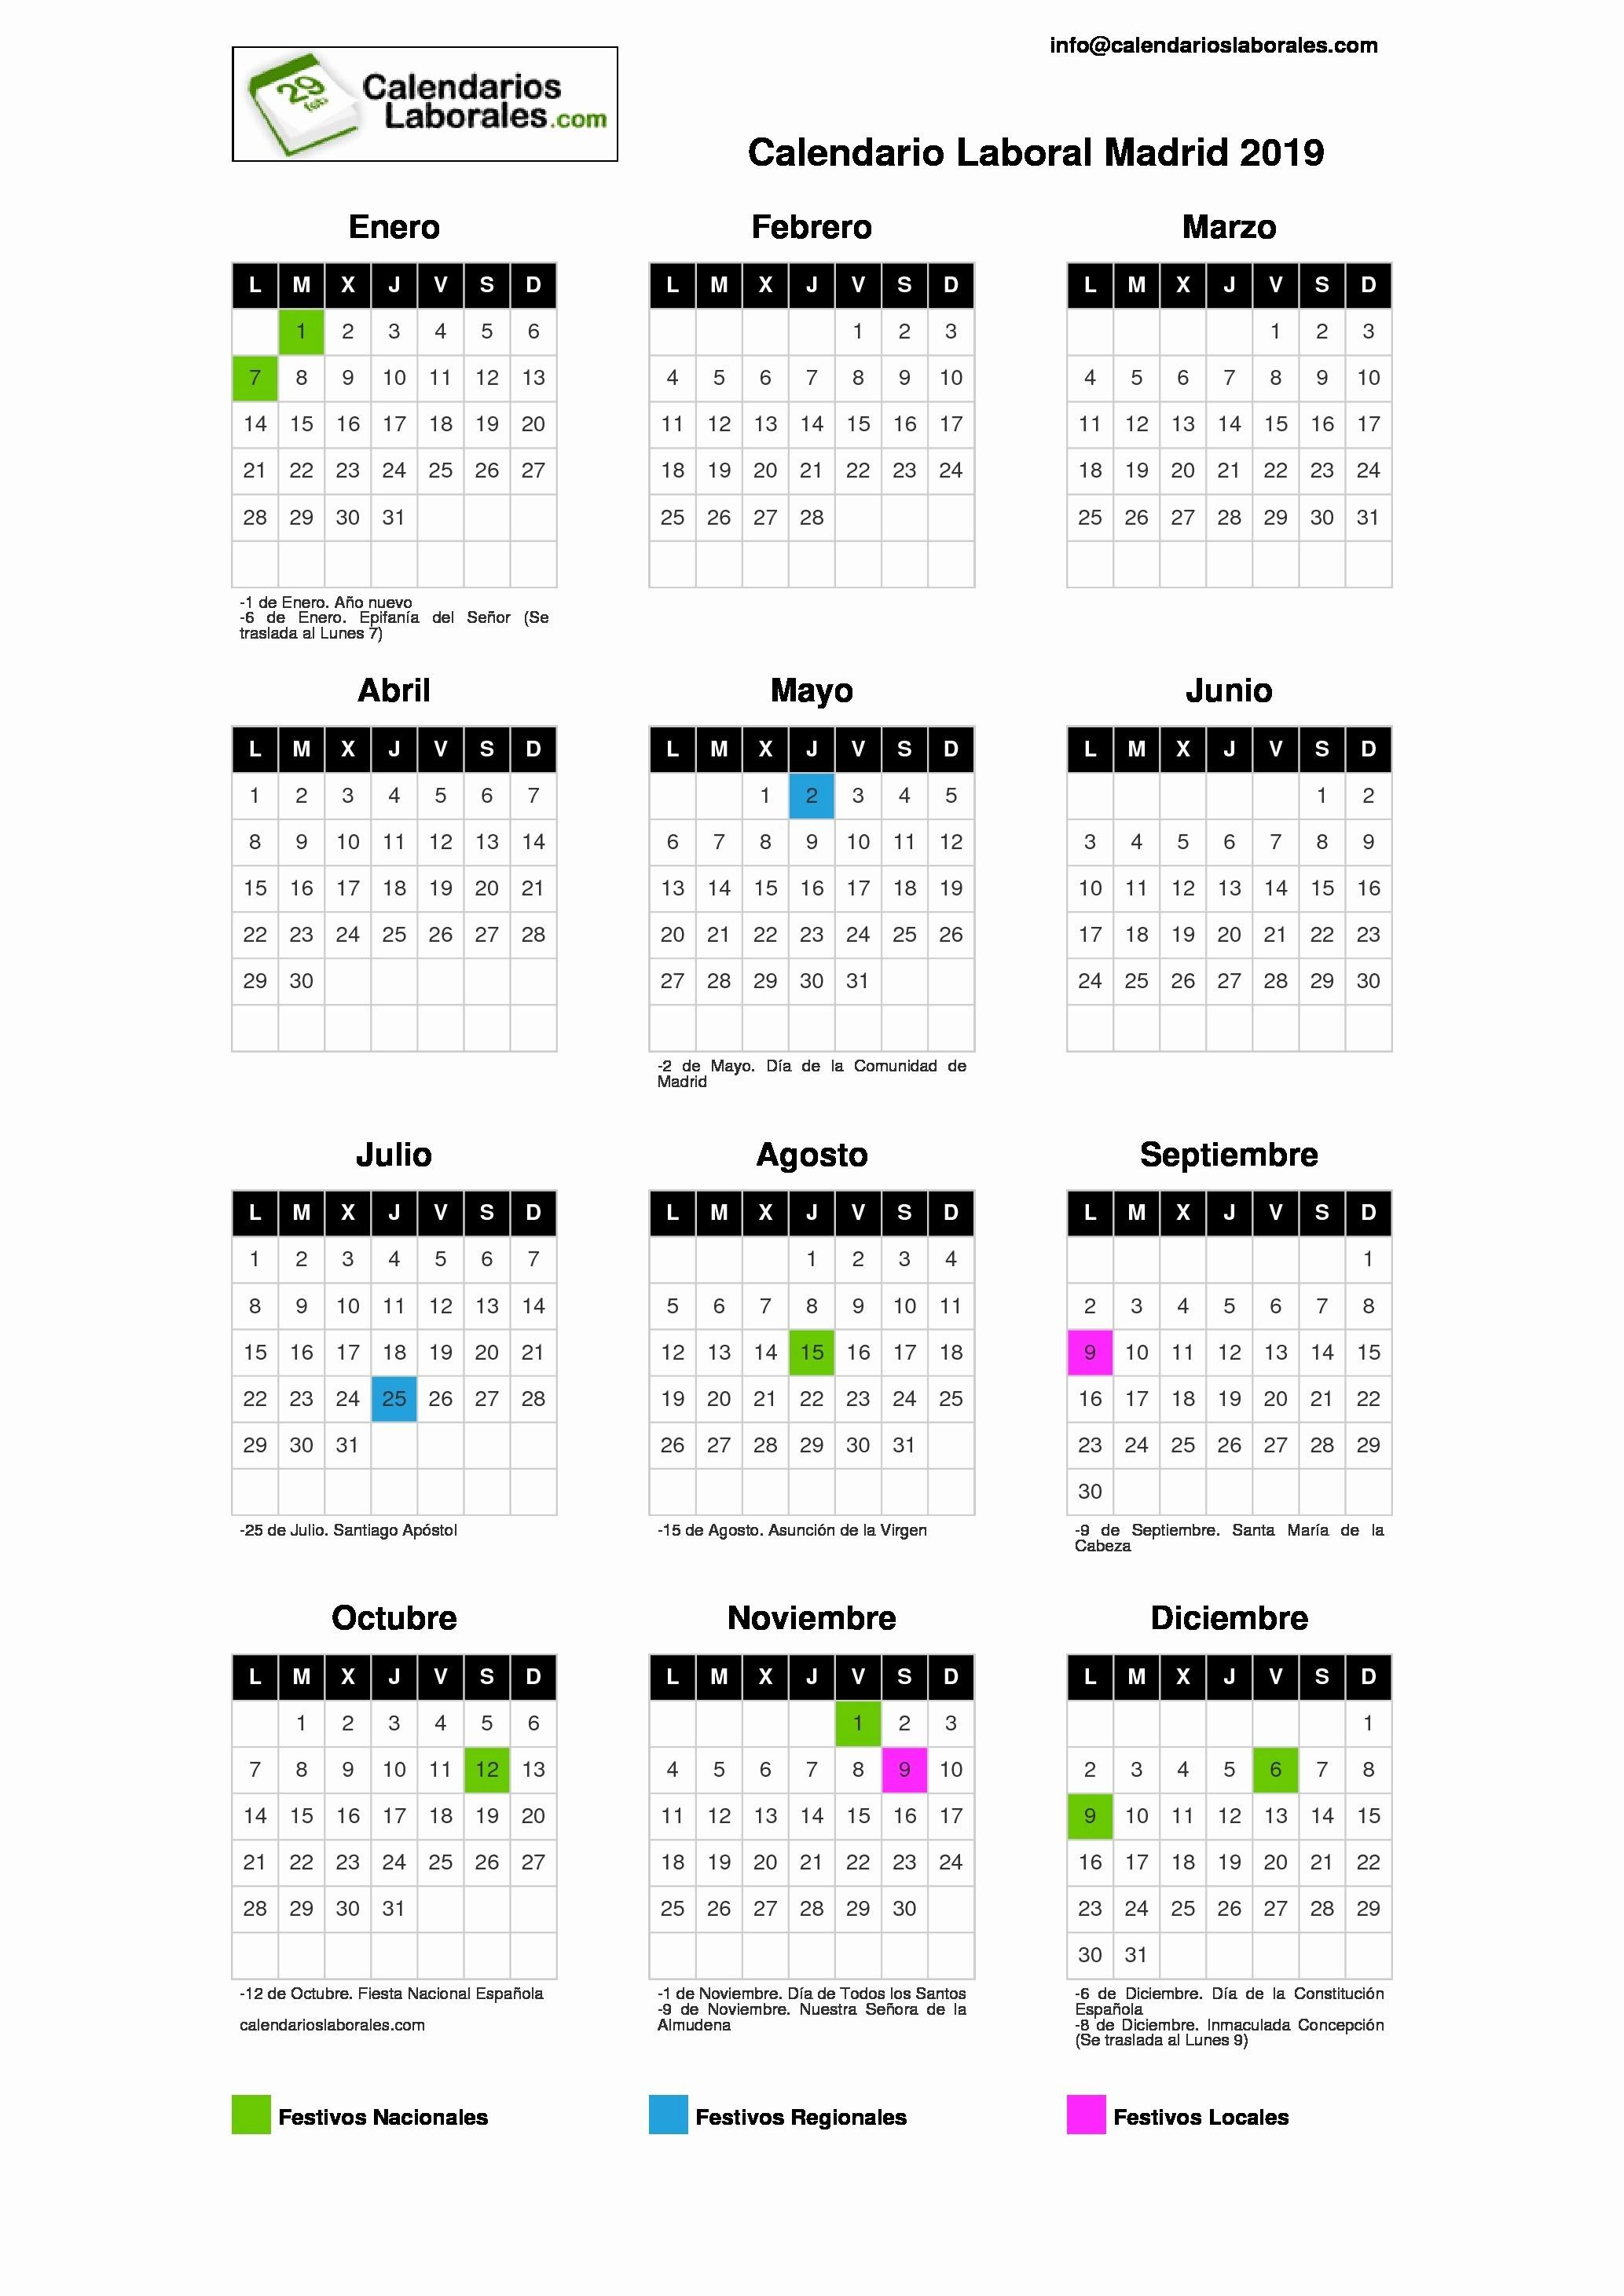 Calendario Dr 2019 Calendario Laboral Madrid 2019